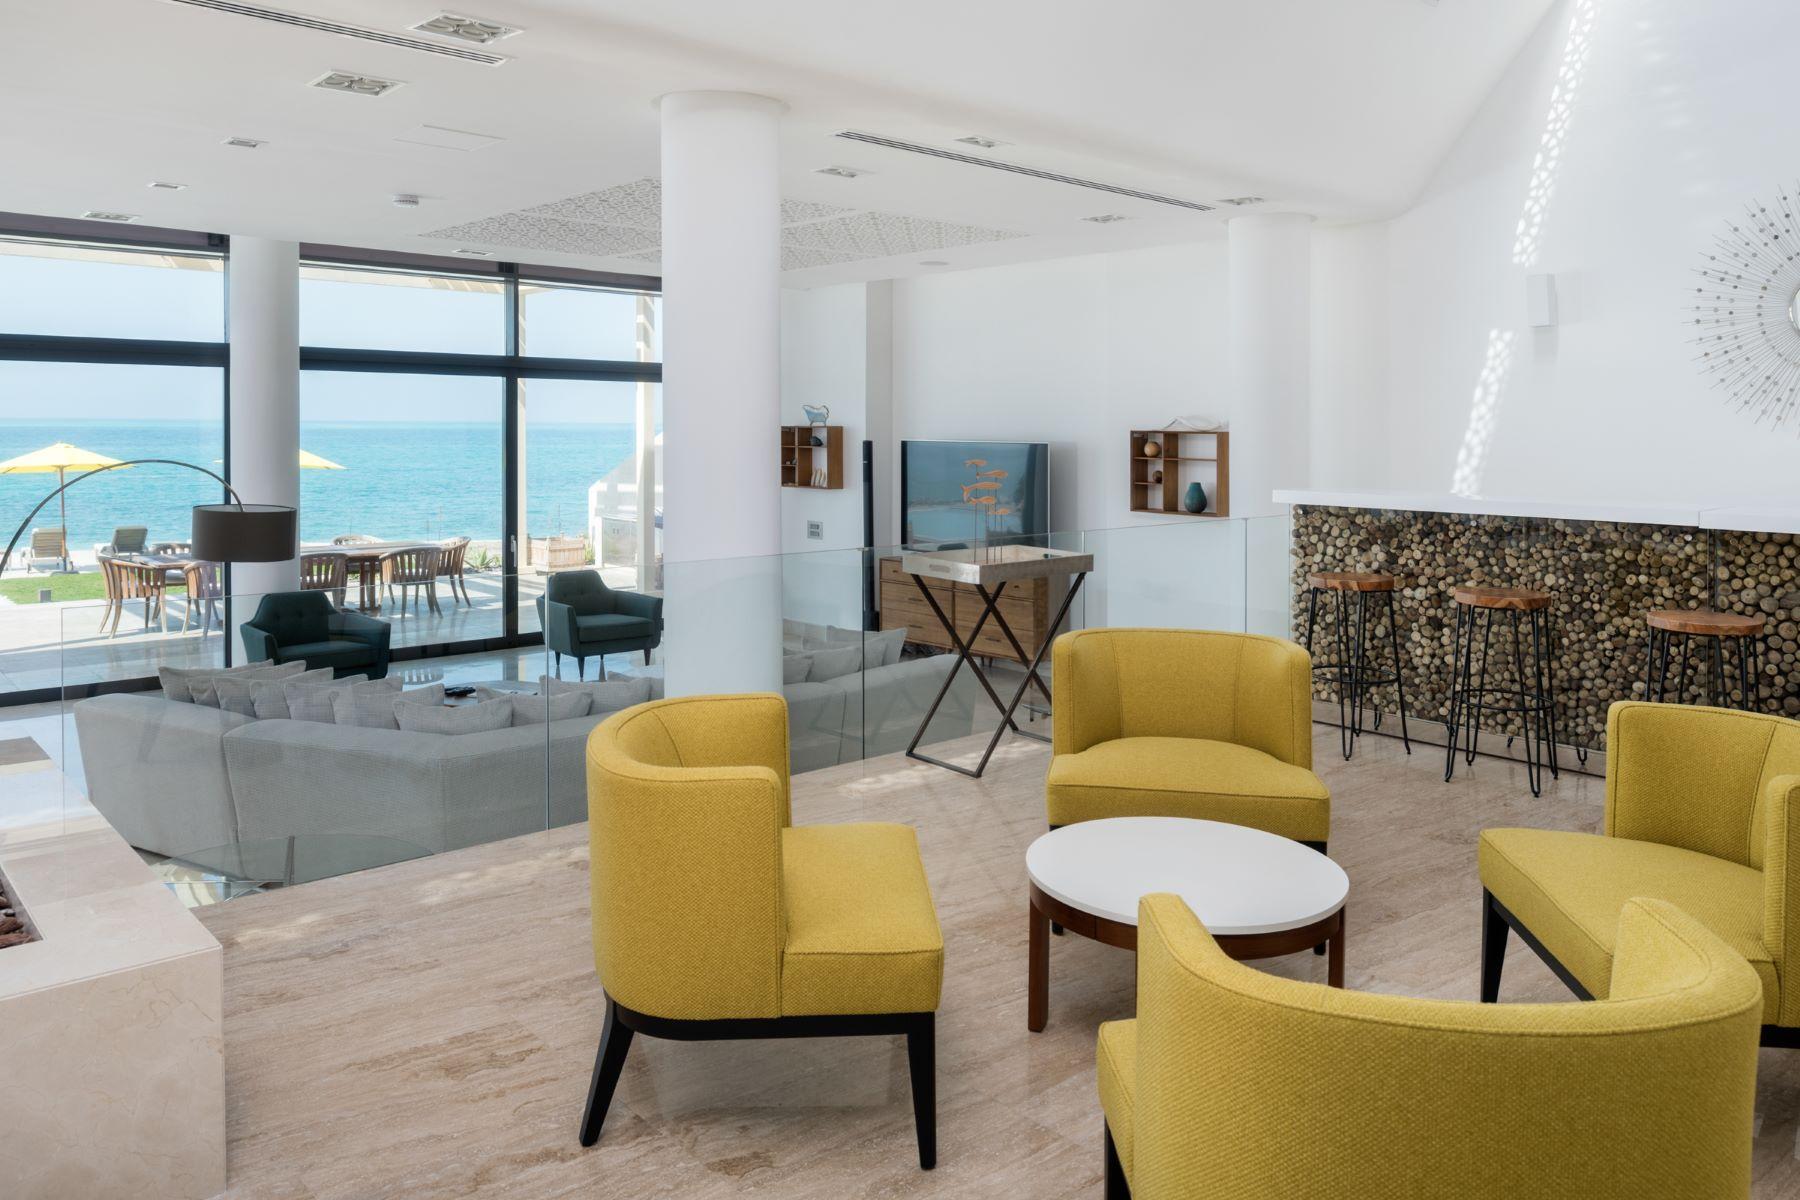 Single Family Home for Sale at Estate Villa Nurai Private Island Abu Dhabi, United Arab Emirates